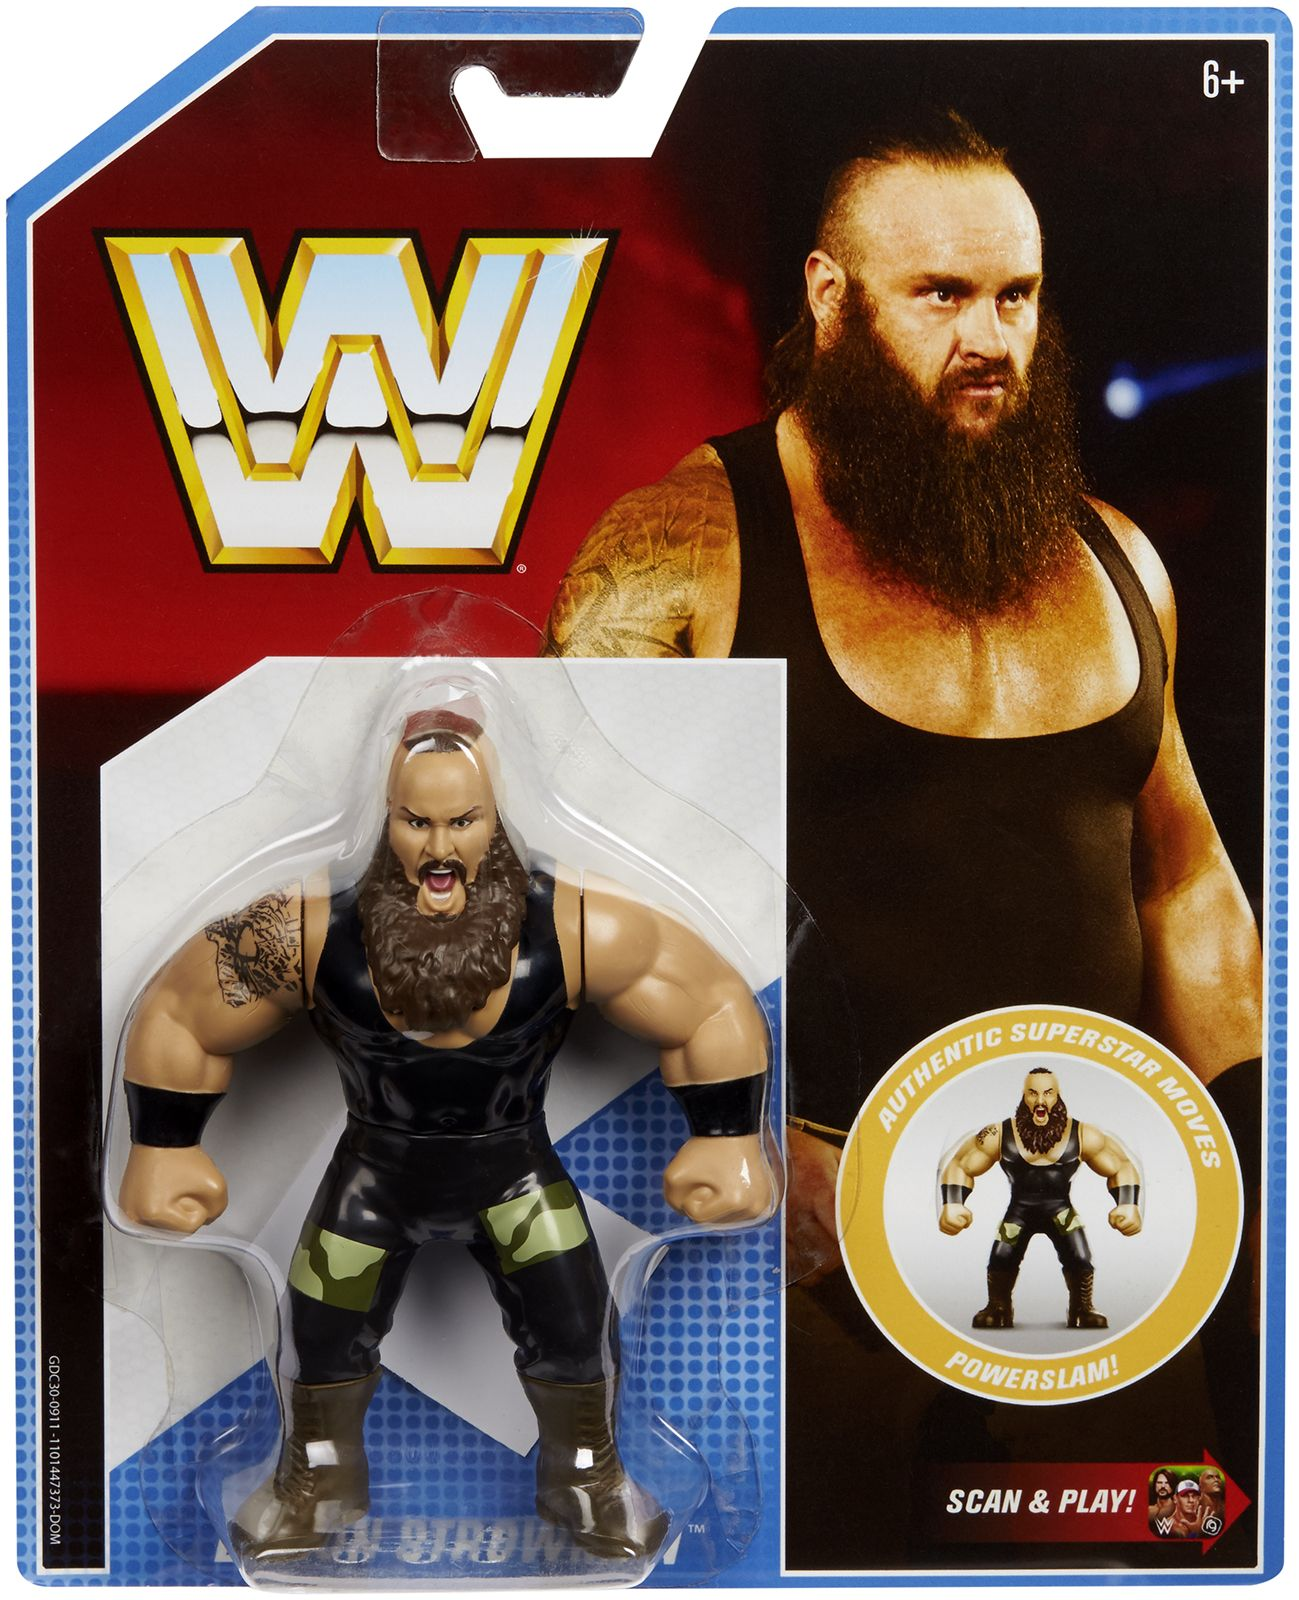 WWE WRESTLING RETRO SERIES STING SUPERSTAR WRESTLER ACTION FIGURE MATTEL